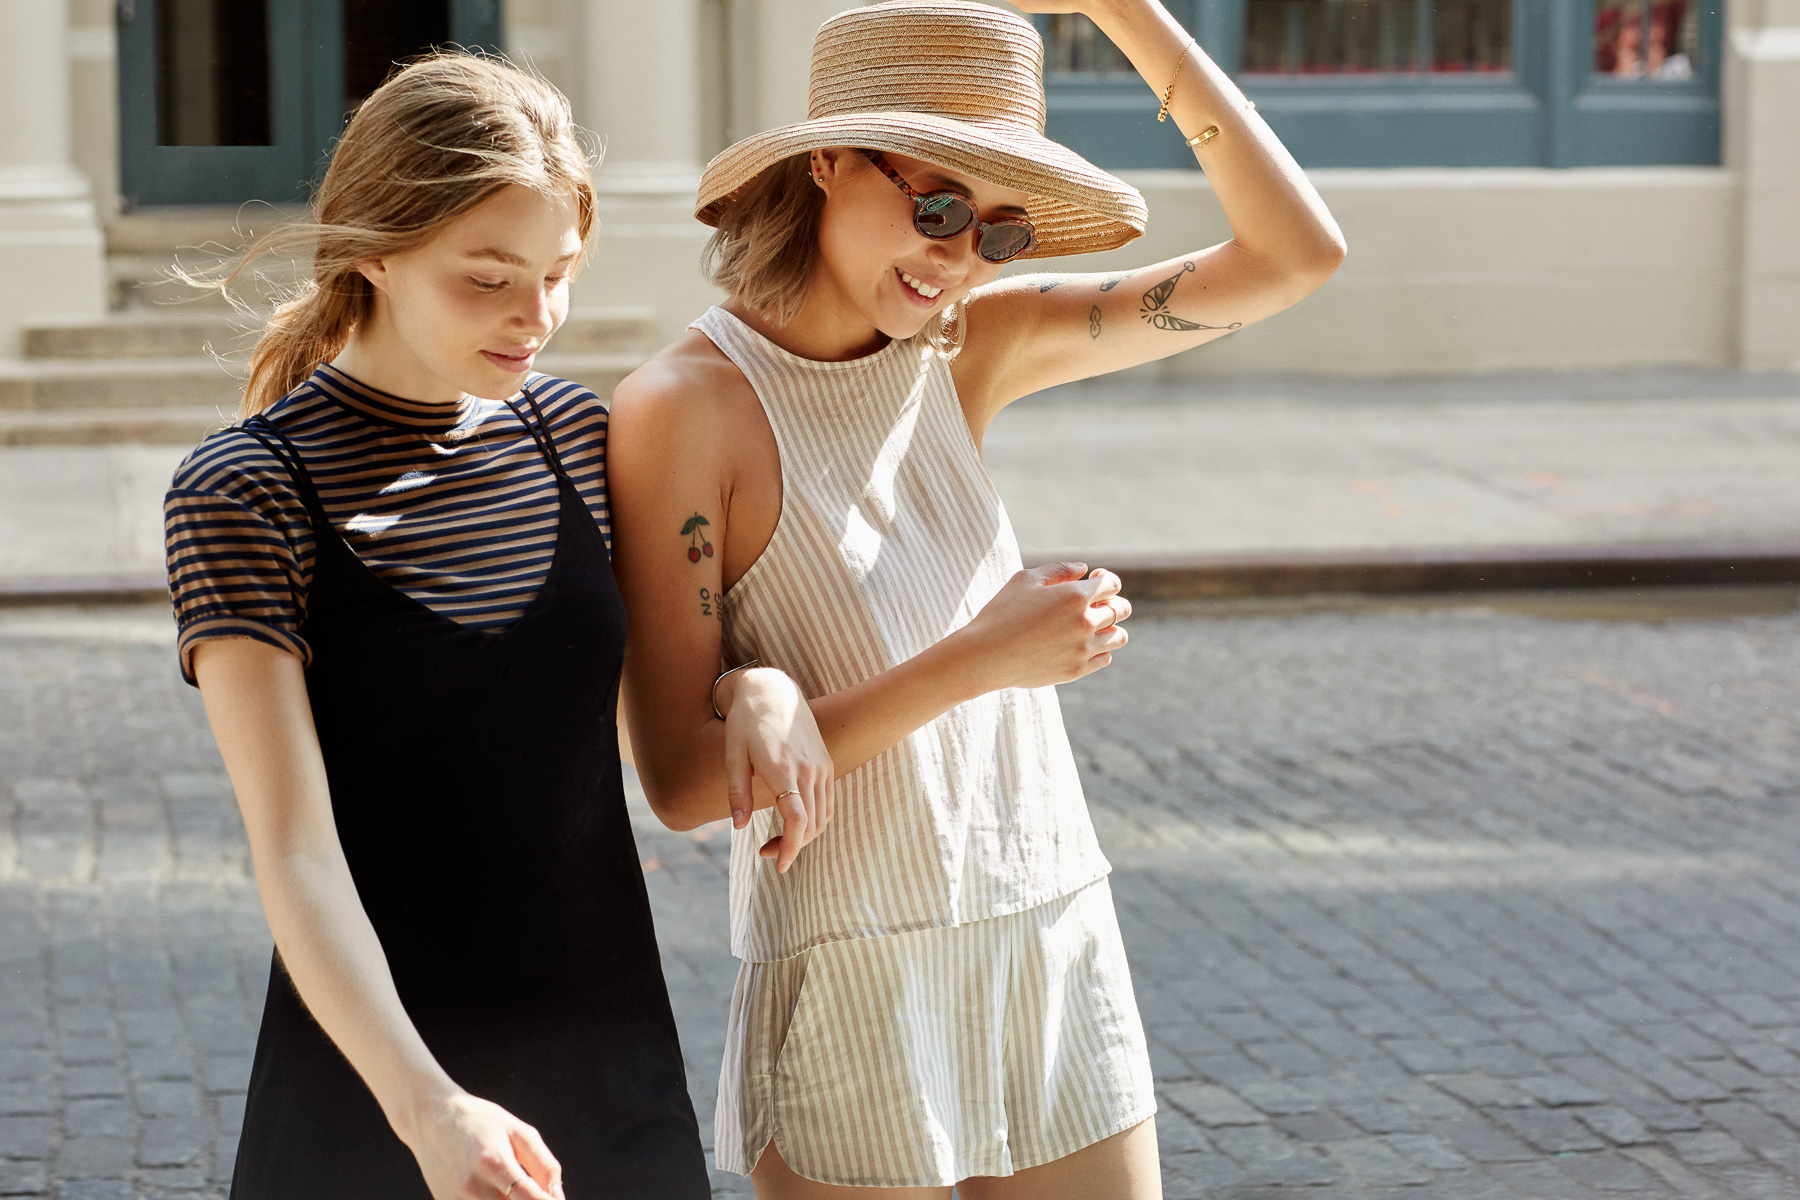 galindo-urban-outfitters-2-51.jpg